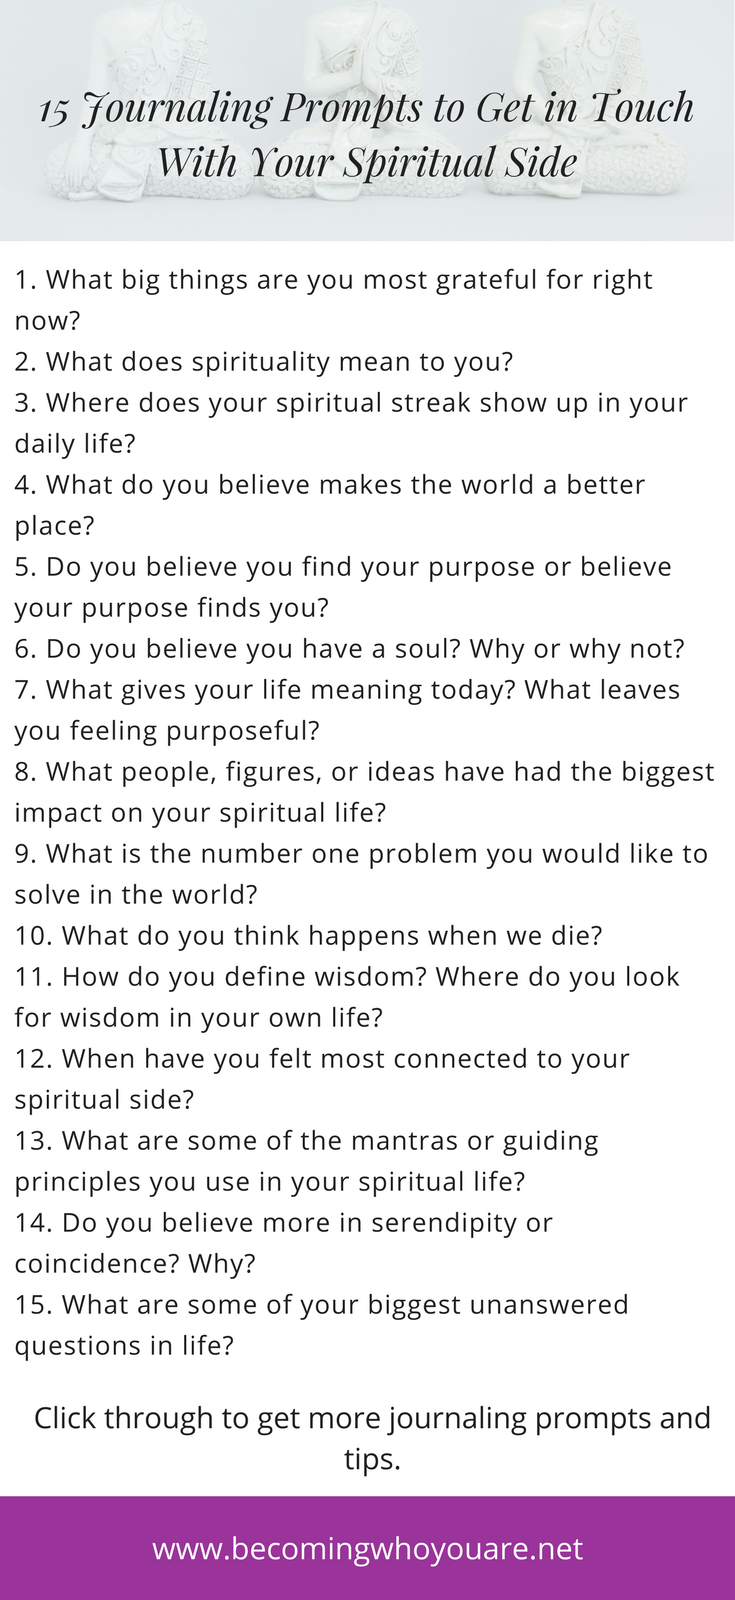 bd11fb5051029e76a2c634df0a85c28c - How To Get In Touch With My Spiritual Self